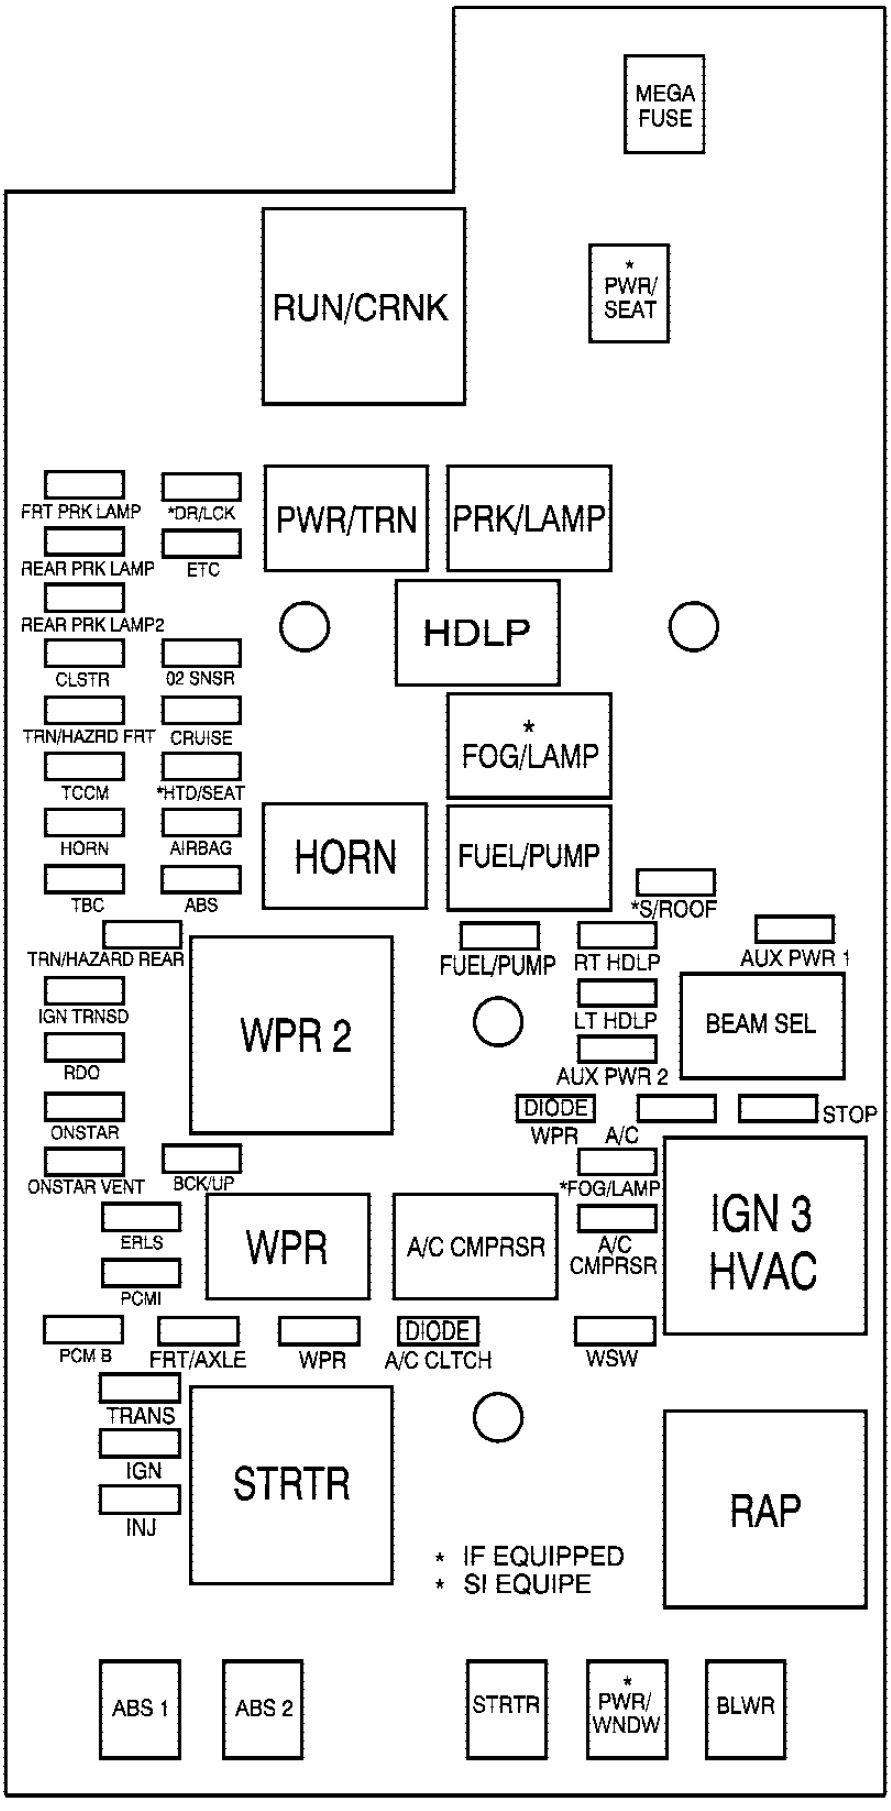 2005 Gmc Canyon Fuse Box Diagram